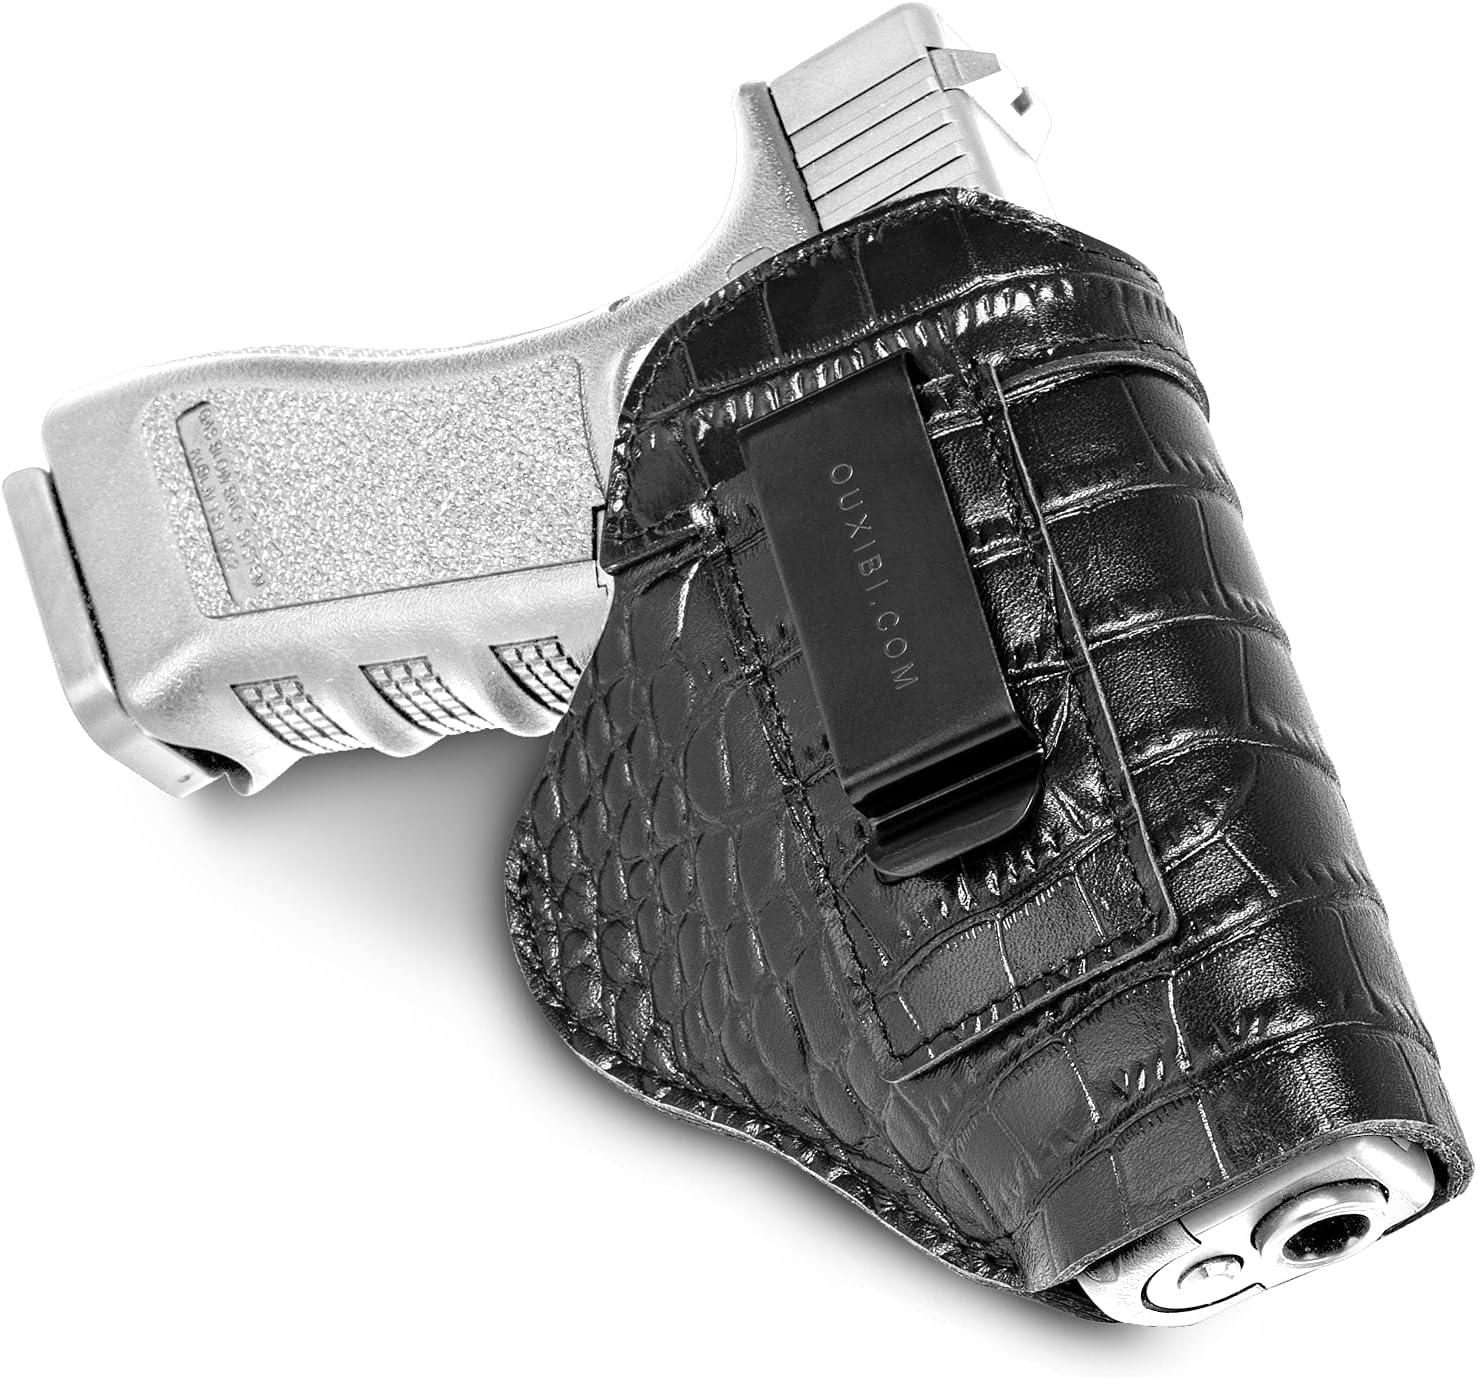 Popular popular Leather Gun Holster - Crocodile Embossed fo Wrap Handgun Conceal Outstanding